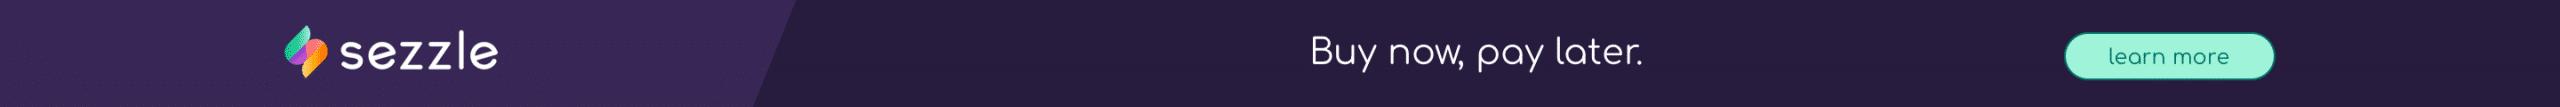 Dropdown-1440x60-purple